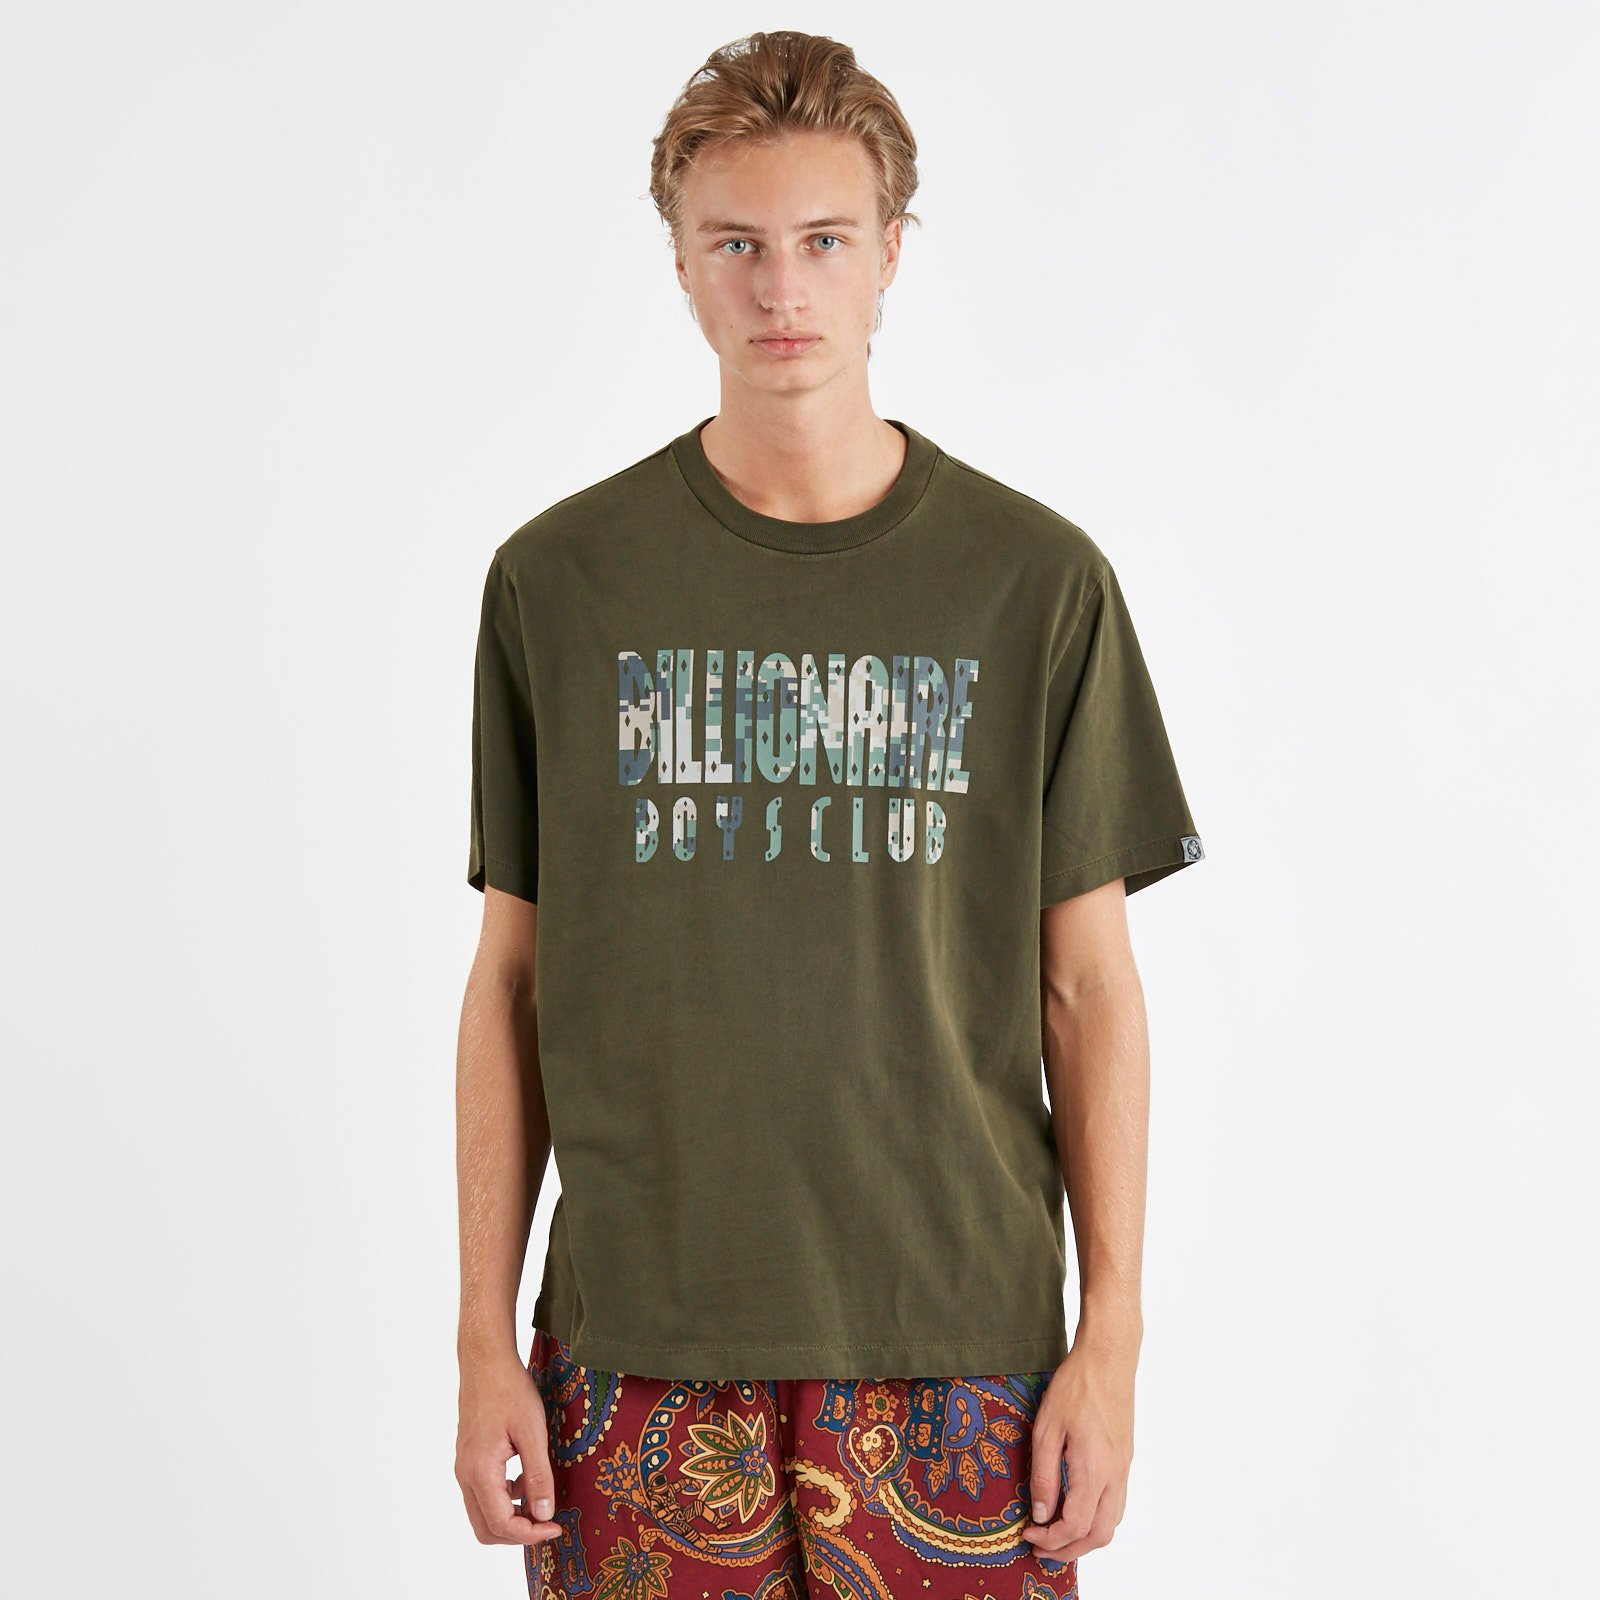 d1ac3a641 Billionaire Boys Club Overdye Digi Camo T-Shirt - B18339olive ...